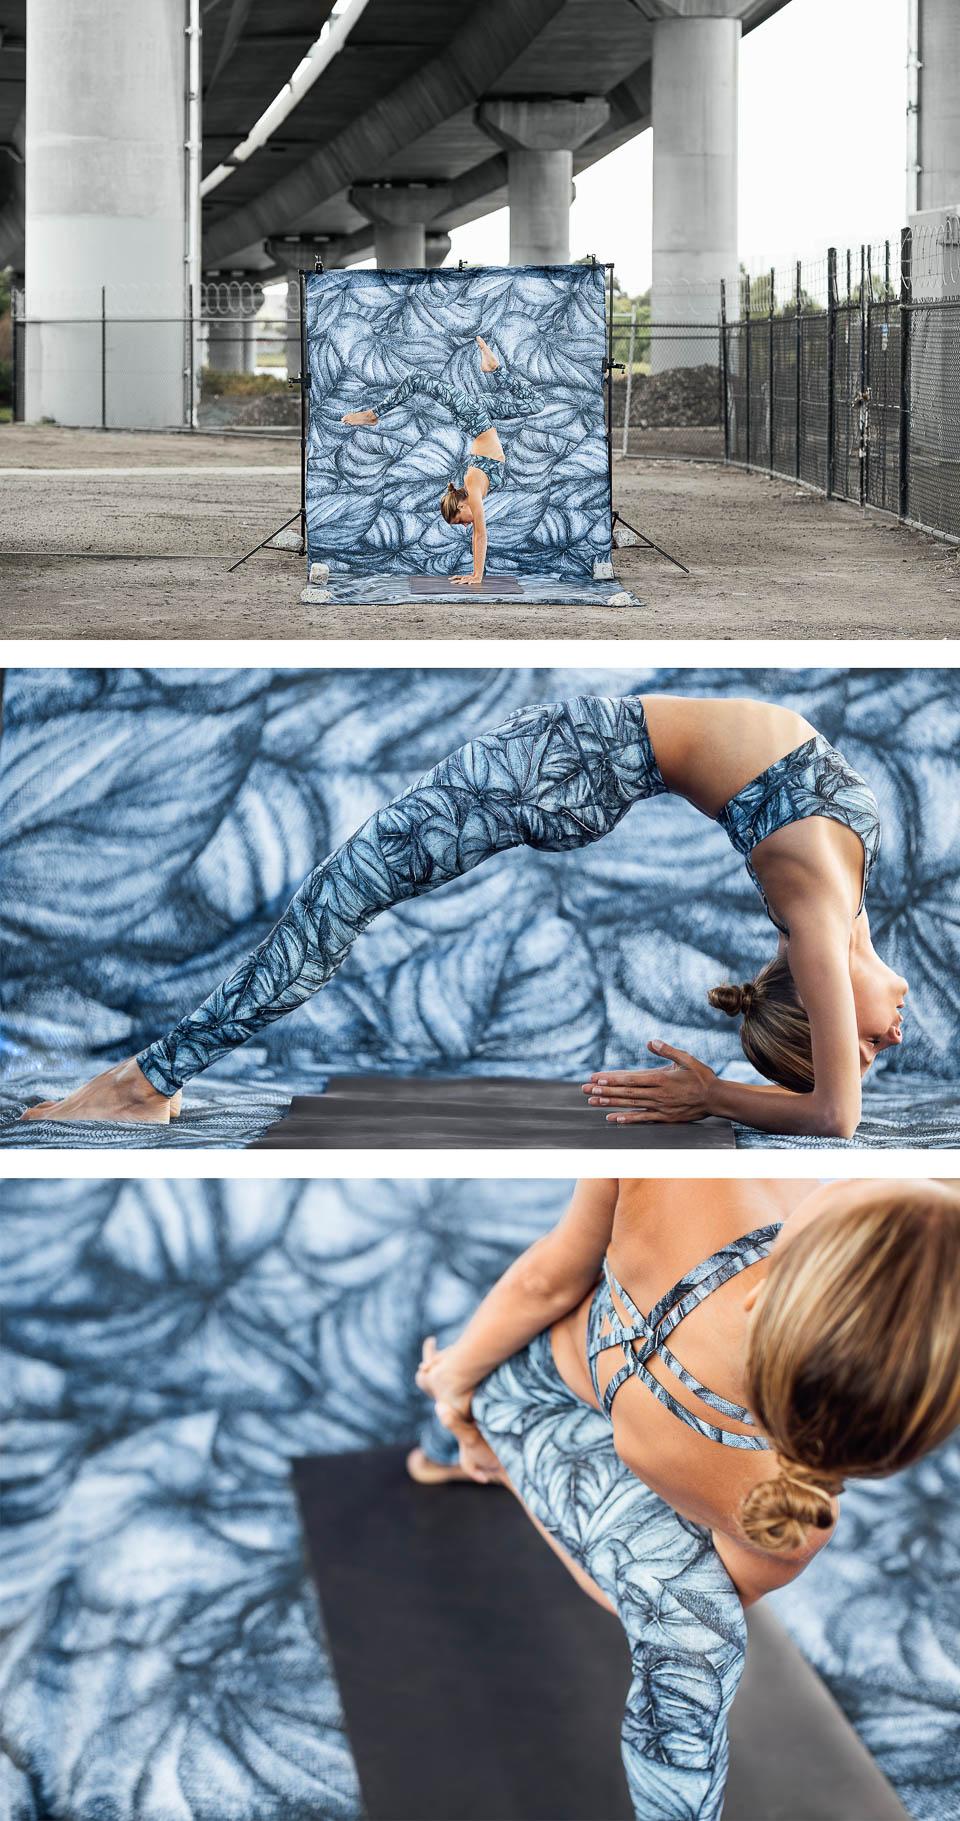 LULU_WEB_2017_Q1_MK_AUTUMN_wk06_w_1490_Concrete_Jungle_Yoga-Edit-960px.jpg